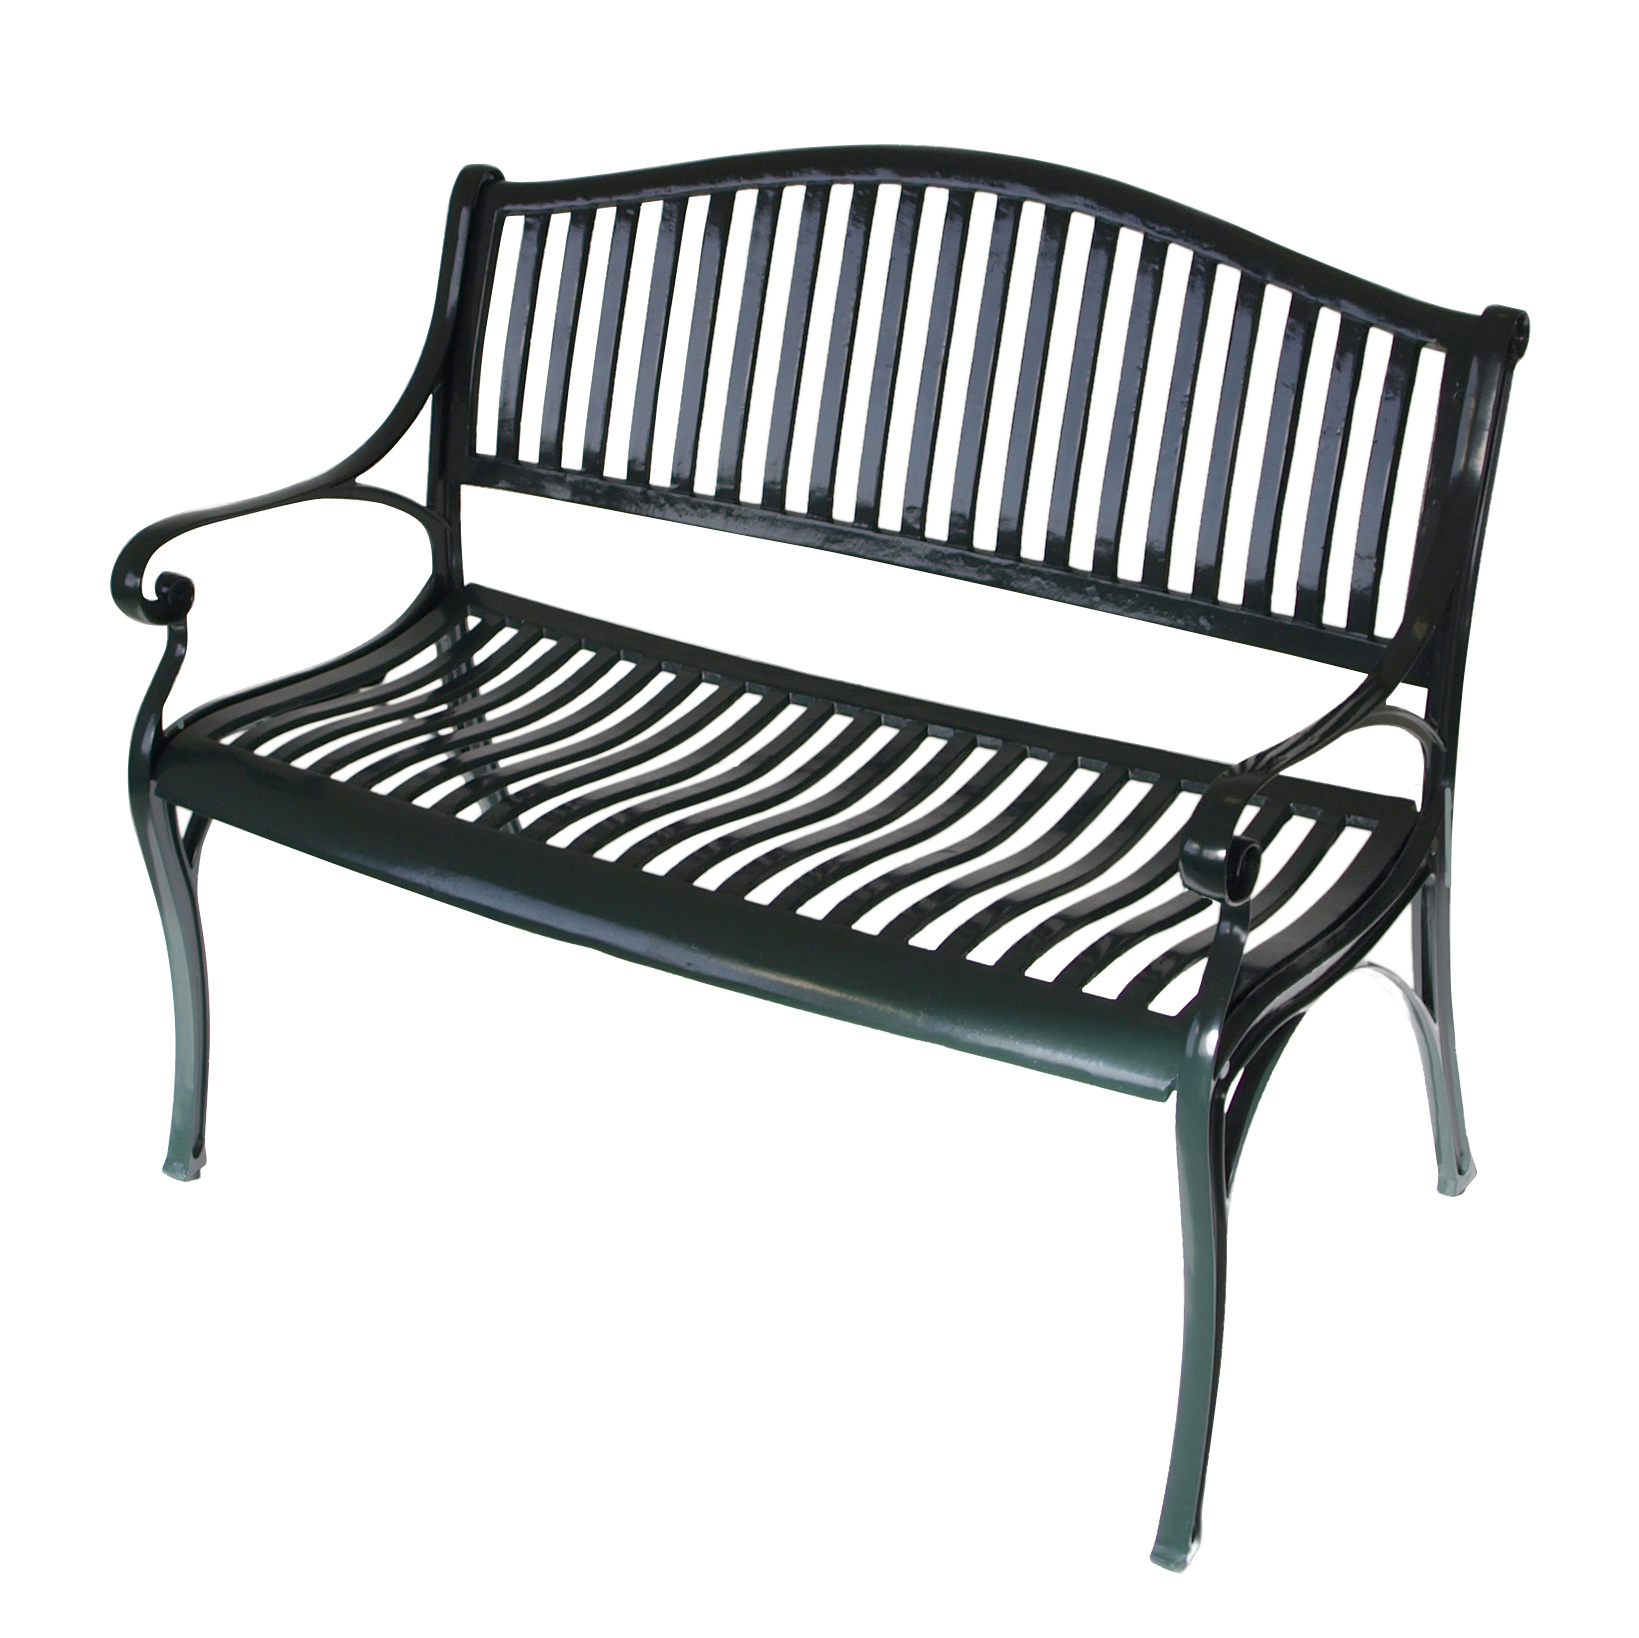 gartenbank napoli 2 sitzer aus wetterfestem aluminium. Black Bedroom Furniture Sets. Home Design Ideas